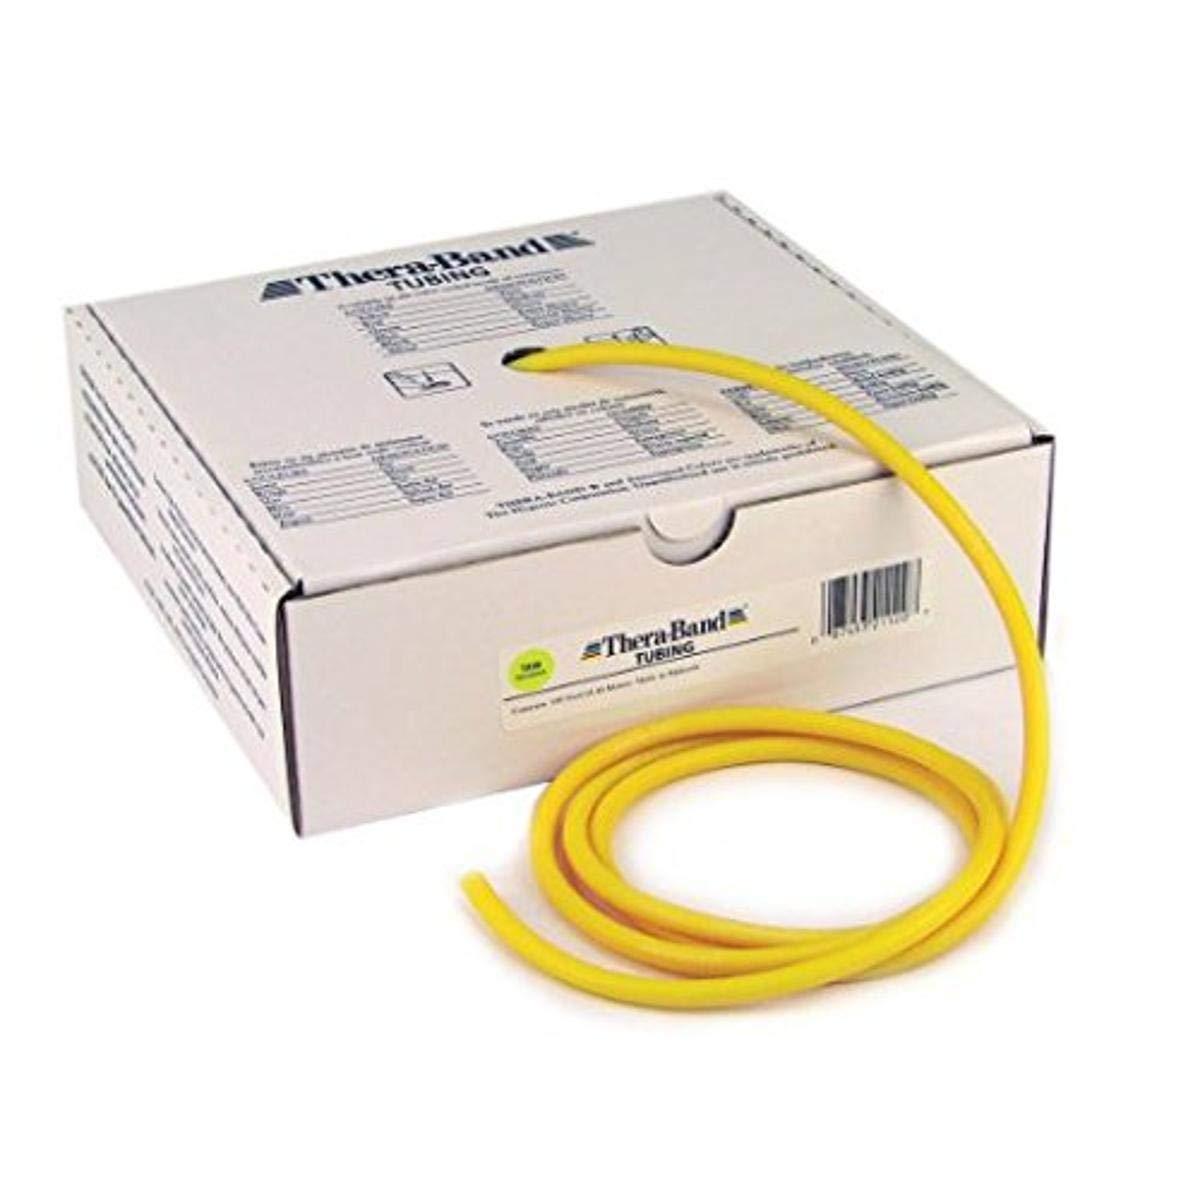 Hygienic Theraband 100% quality warranty! 21120 Professional Resistance X Tube Yellow Popular standard